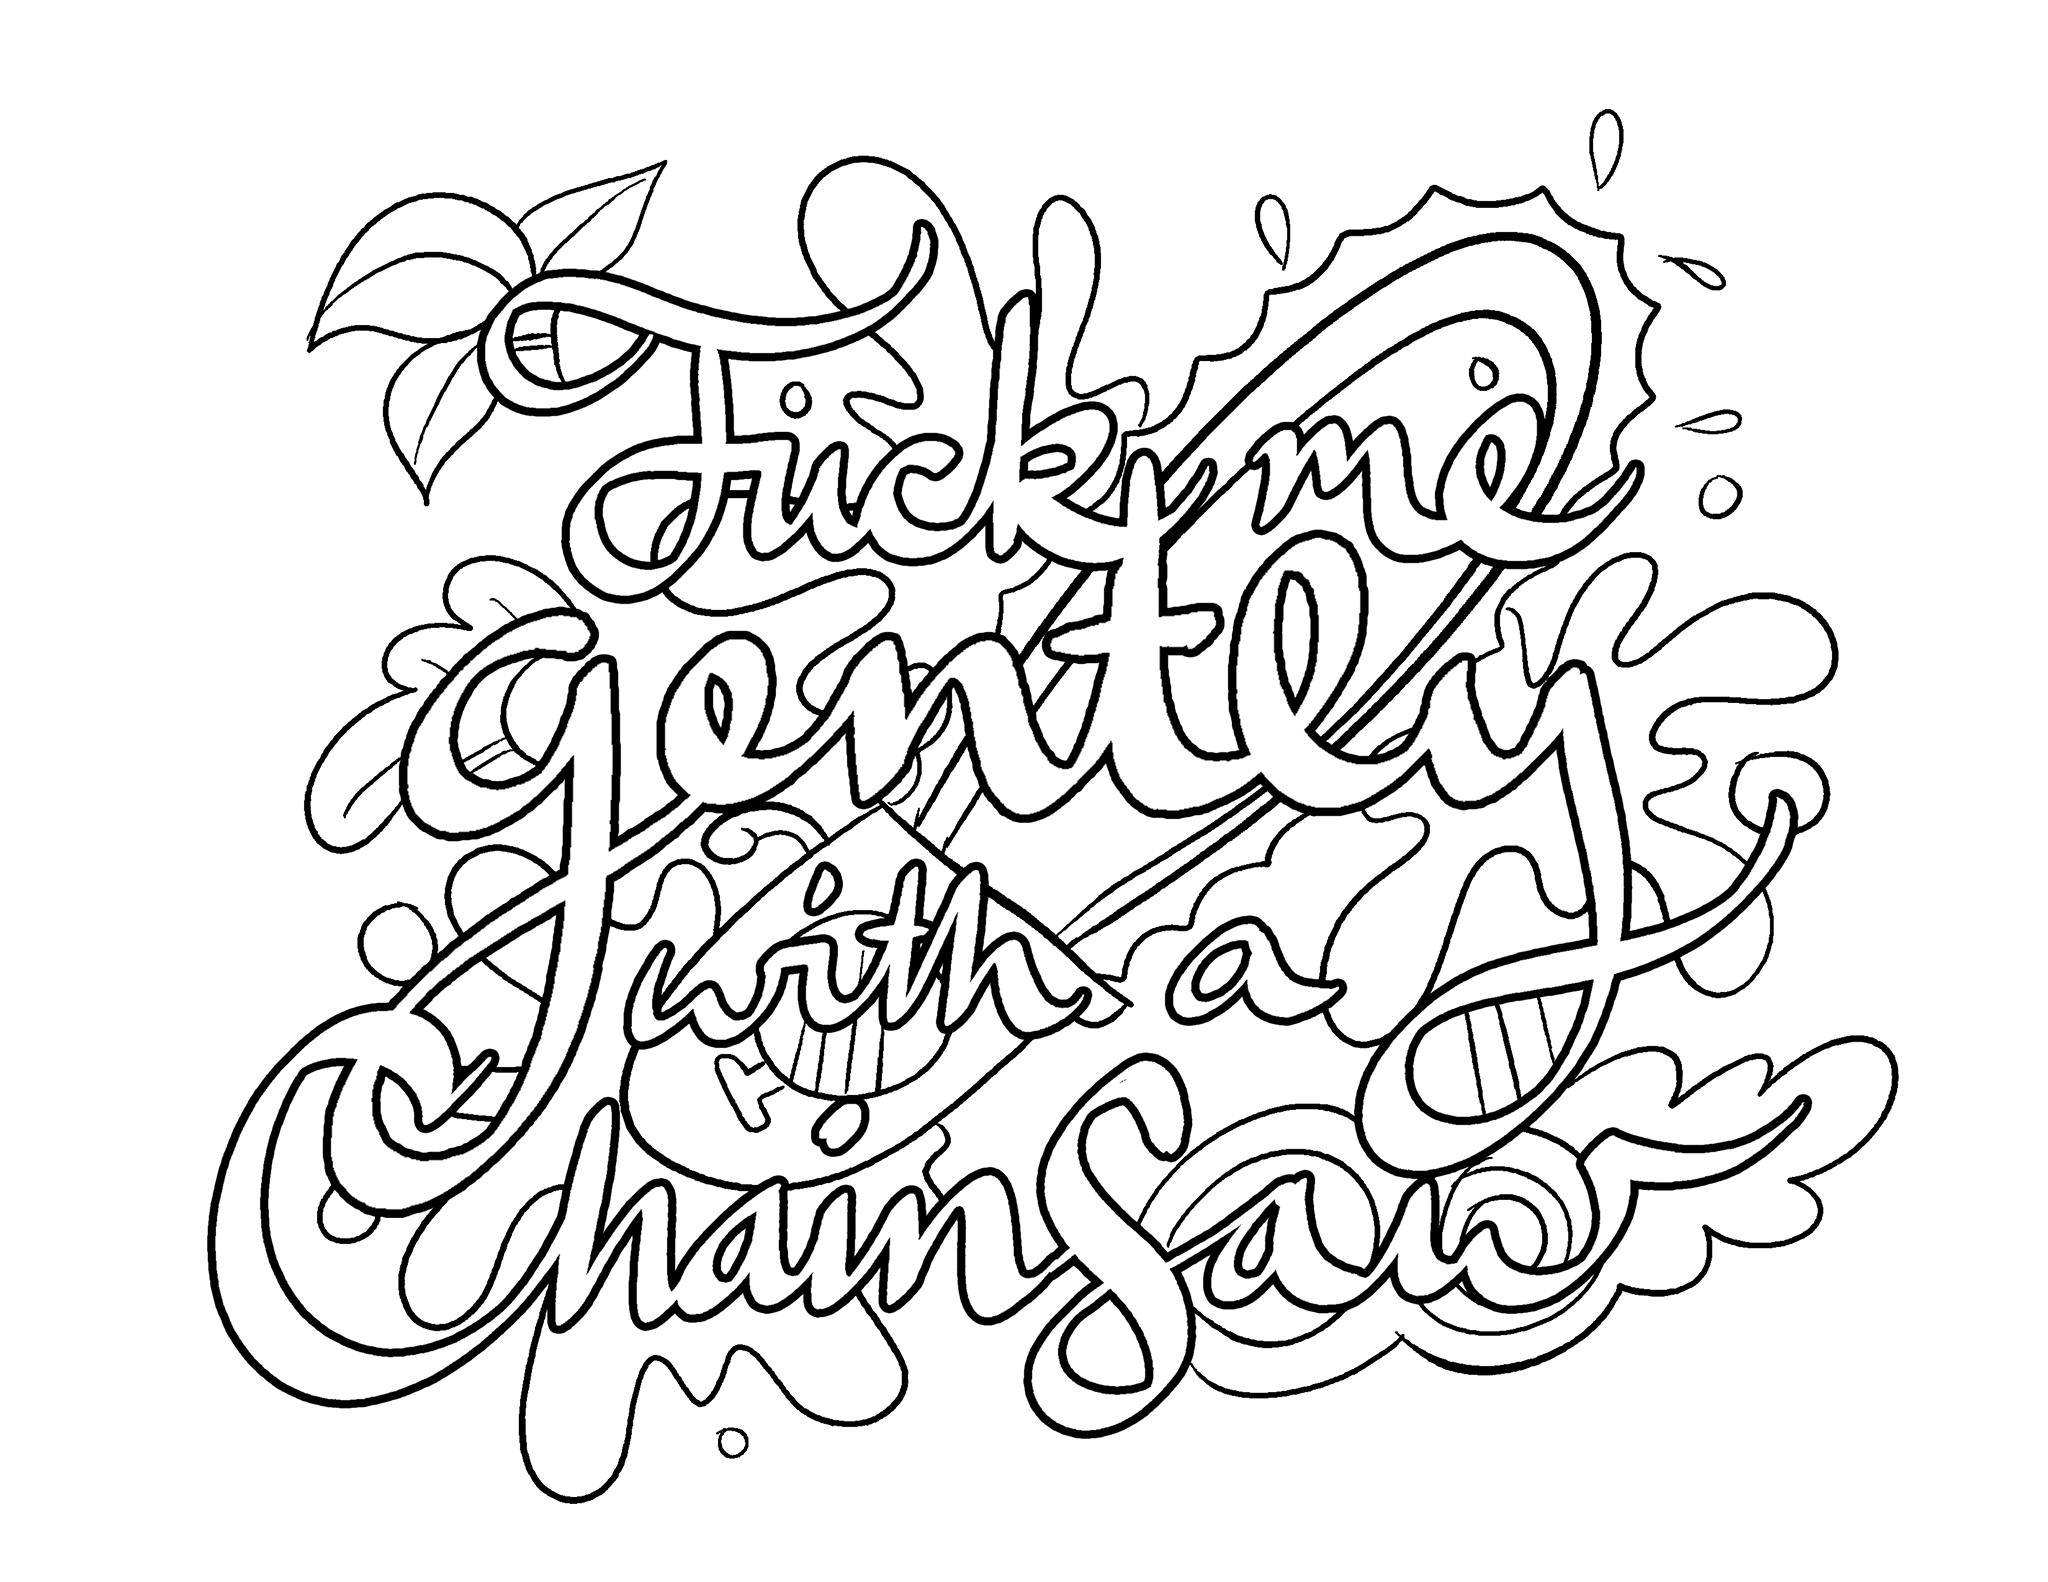 chainsaw coloring pages chainsaw coloring page at getcoloringscom free chainsaw coloring pages